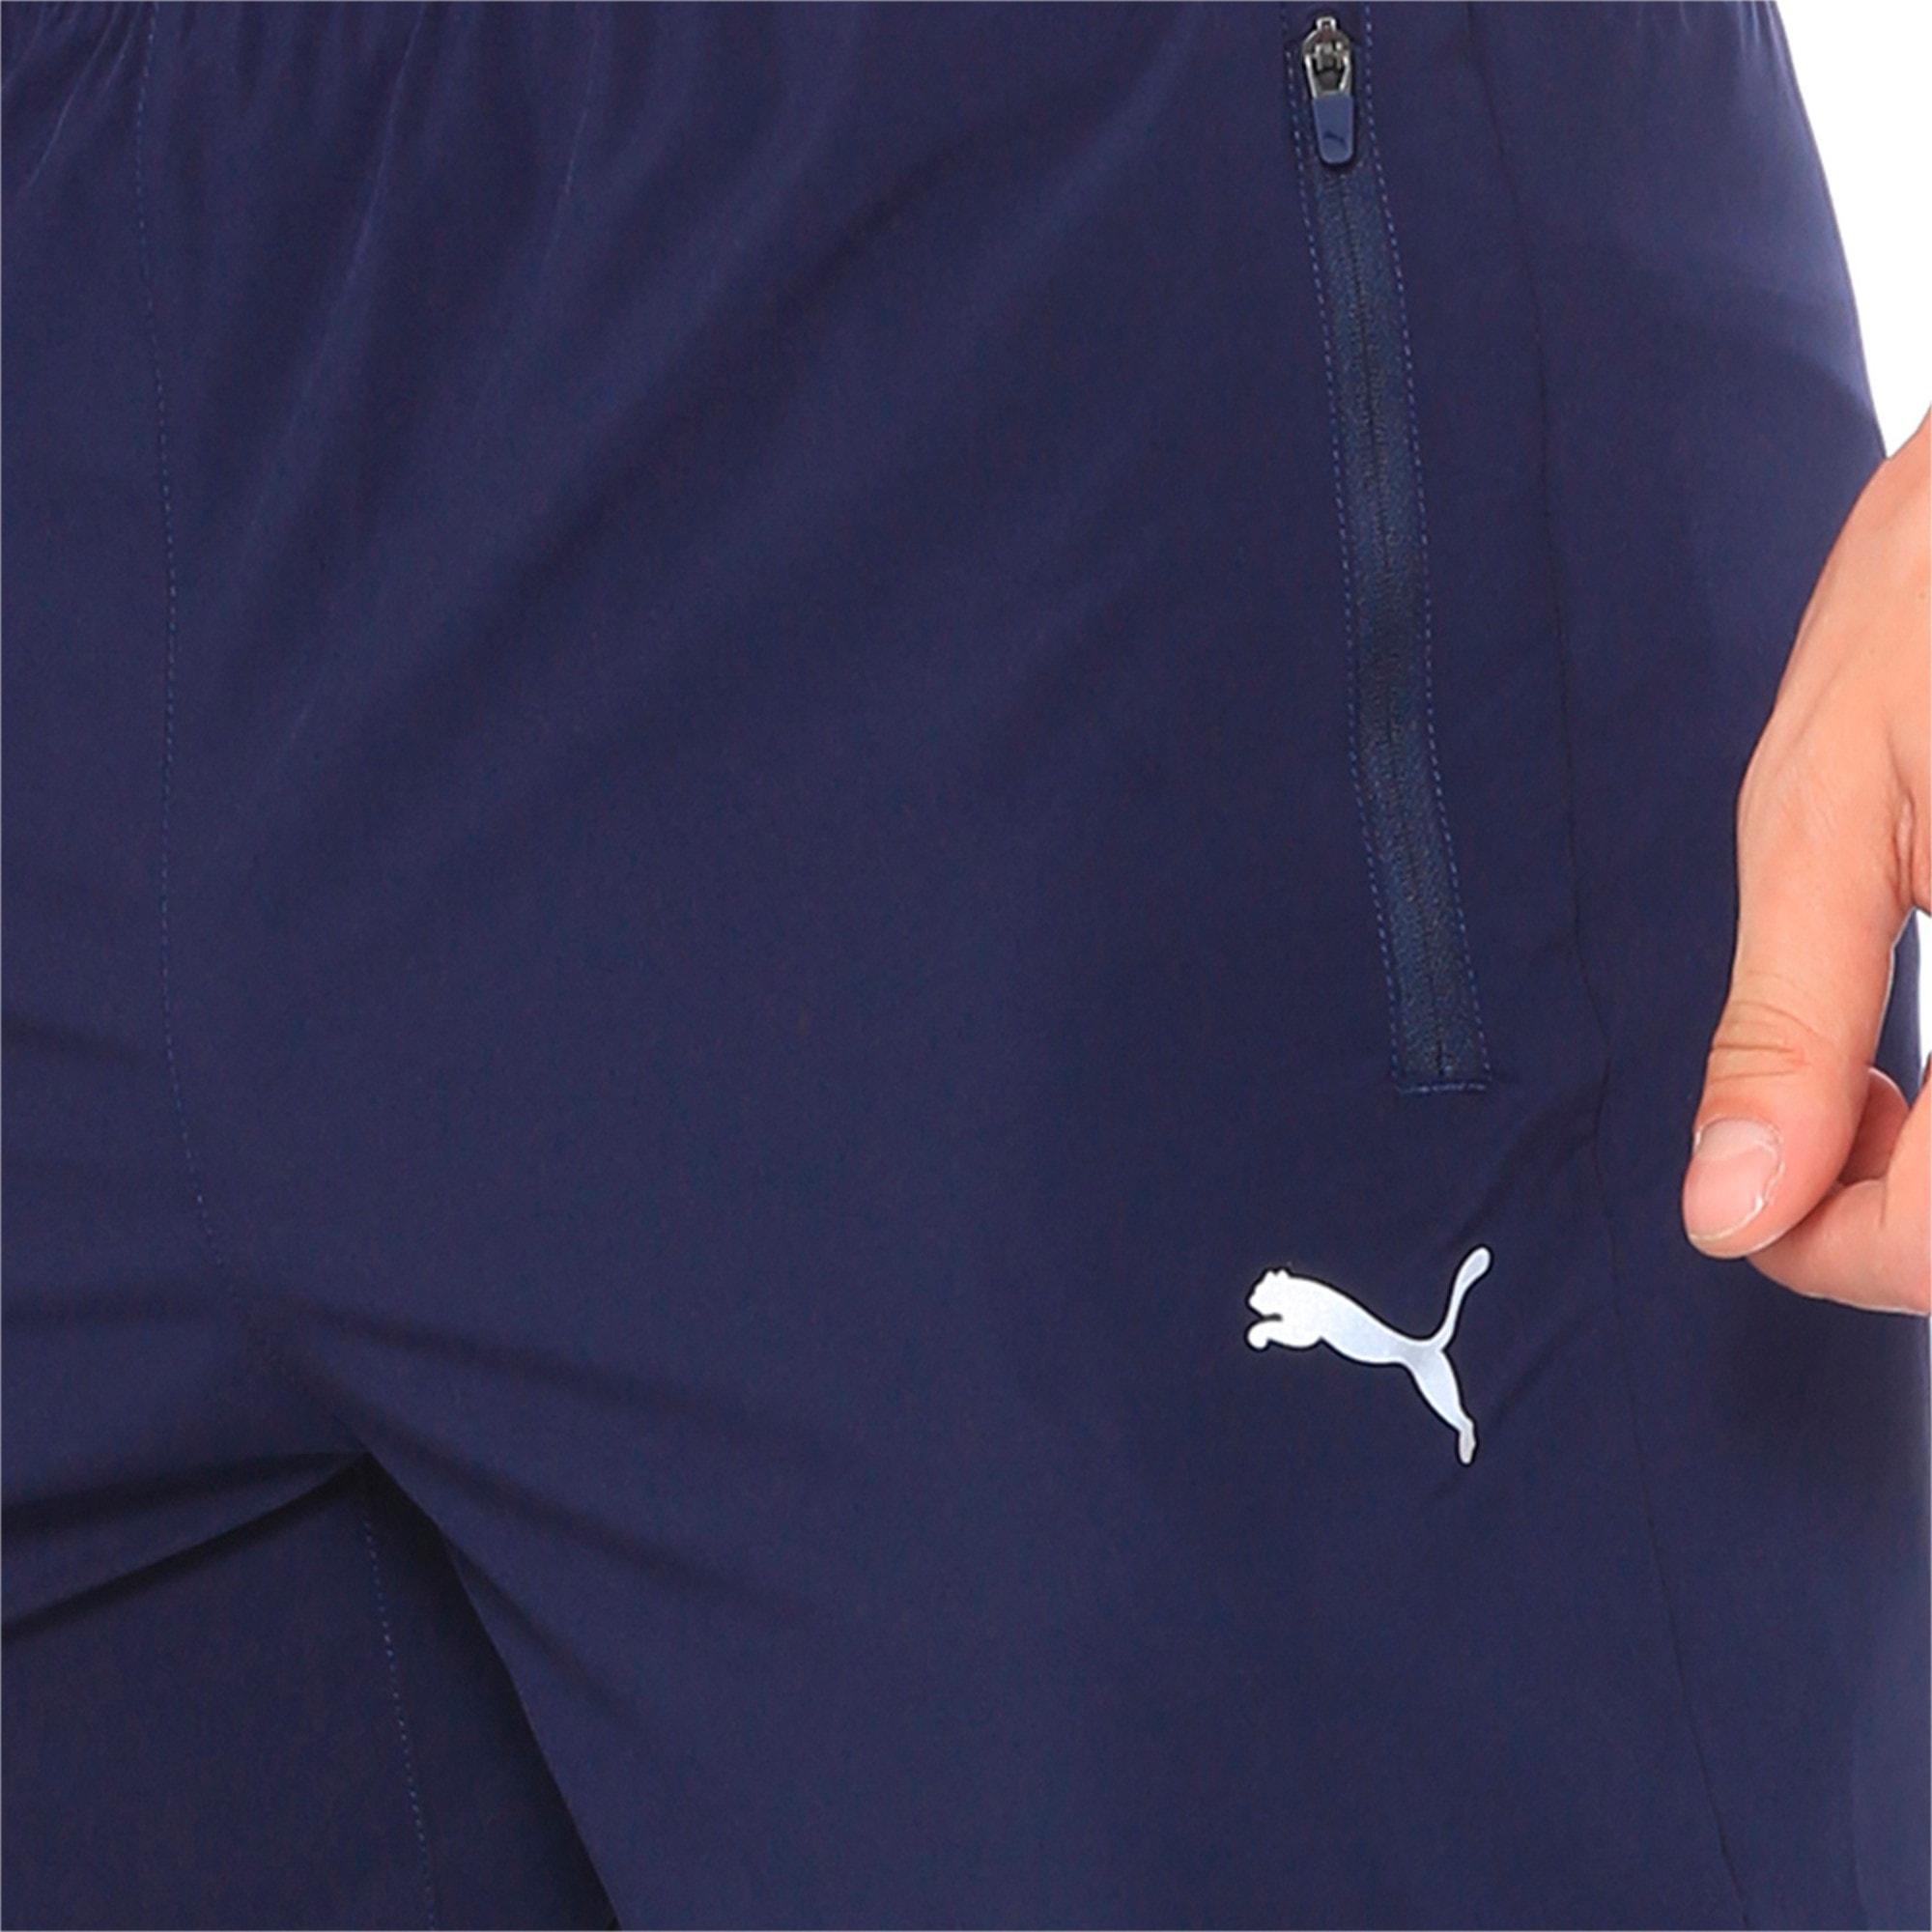 Thumbnail 6 of one8 VK Men's Active Pants, Peacoat, medium-IND